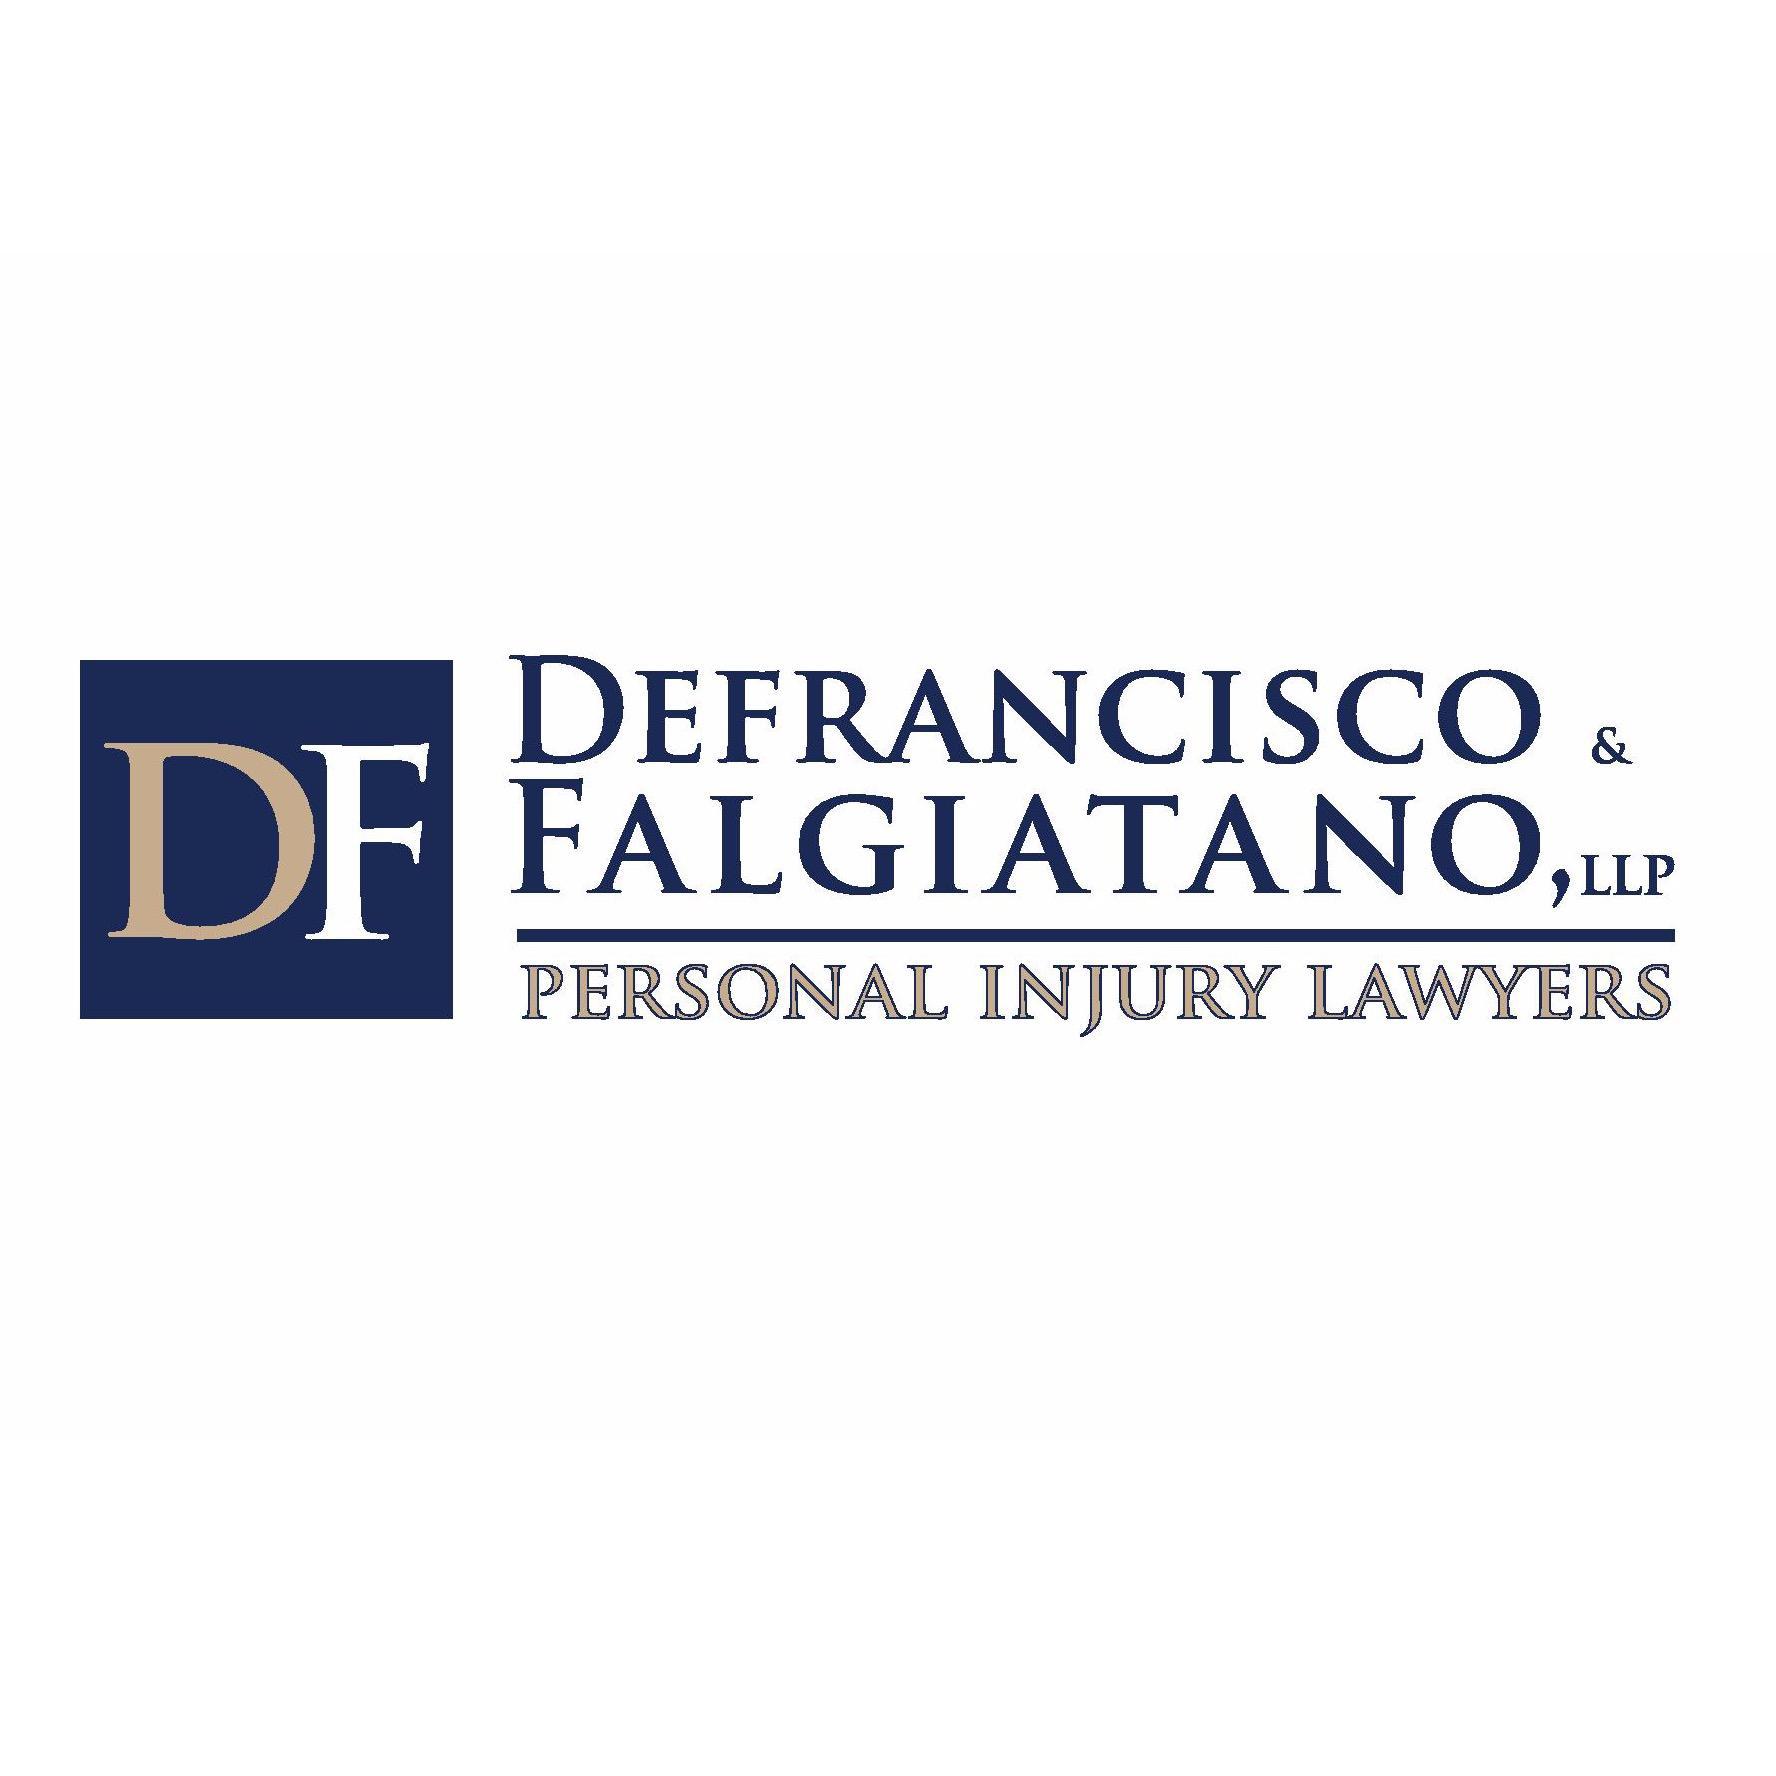 DeFrancisco & Falgiatano Personal Injury Lawyers